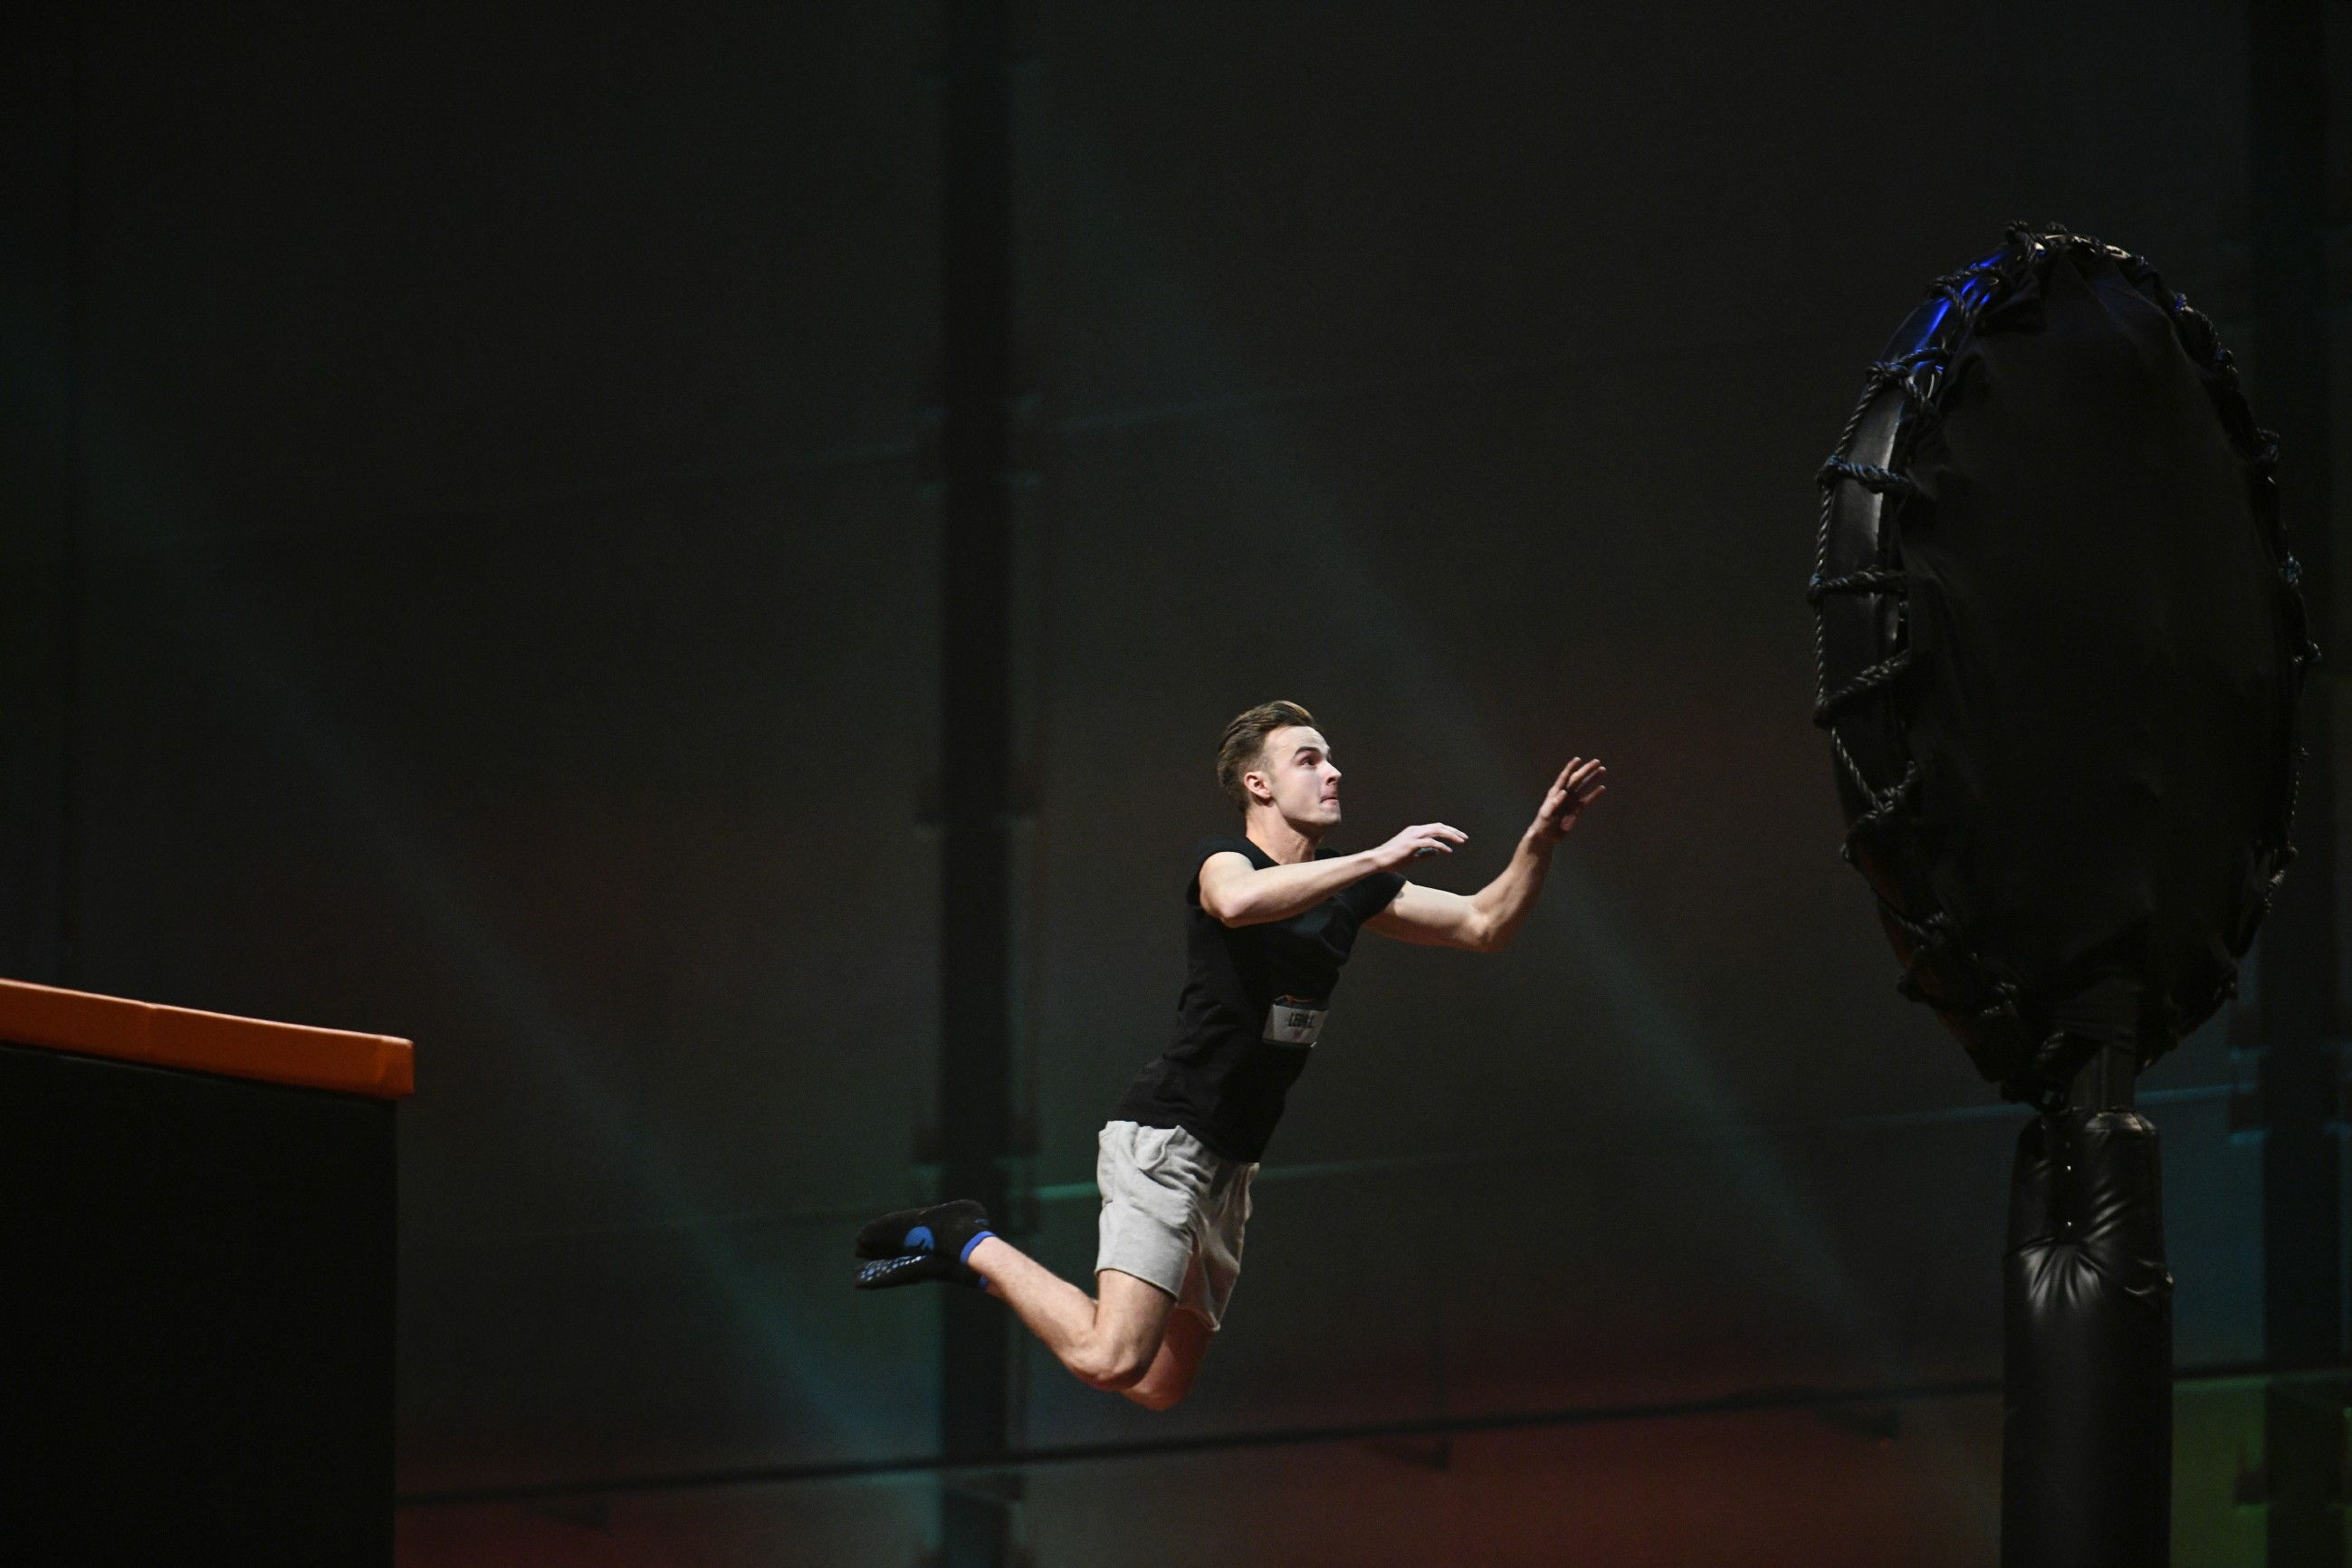 Big Bounce Finale - Leon Lautenschläger